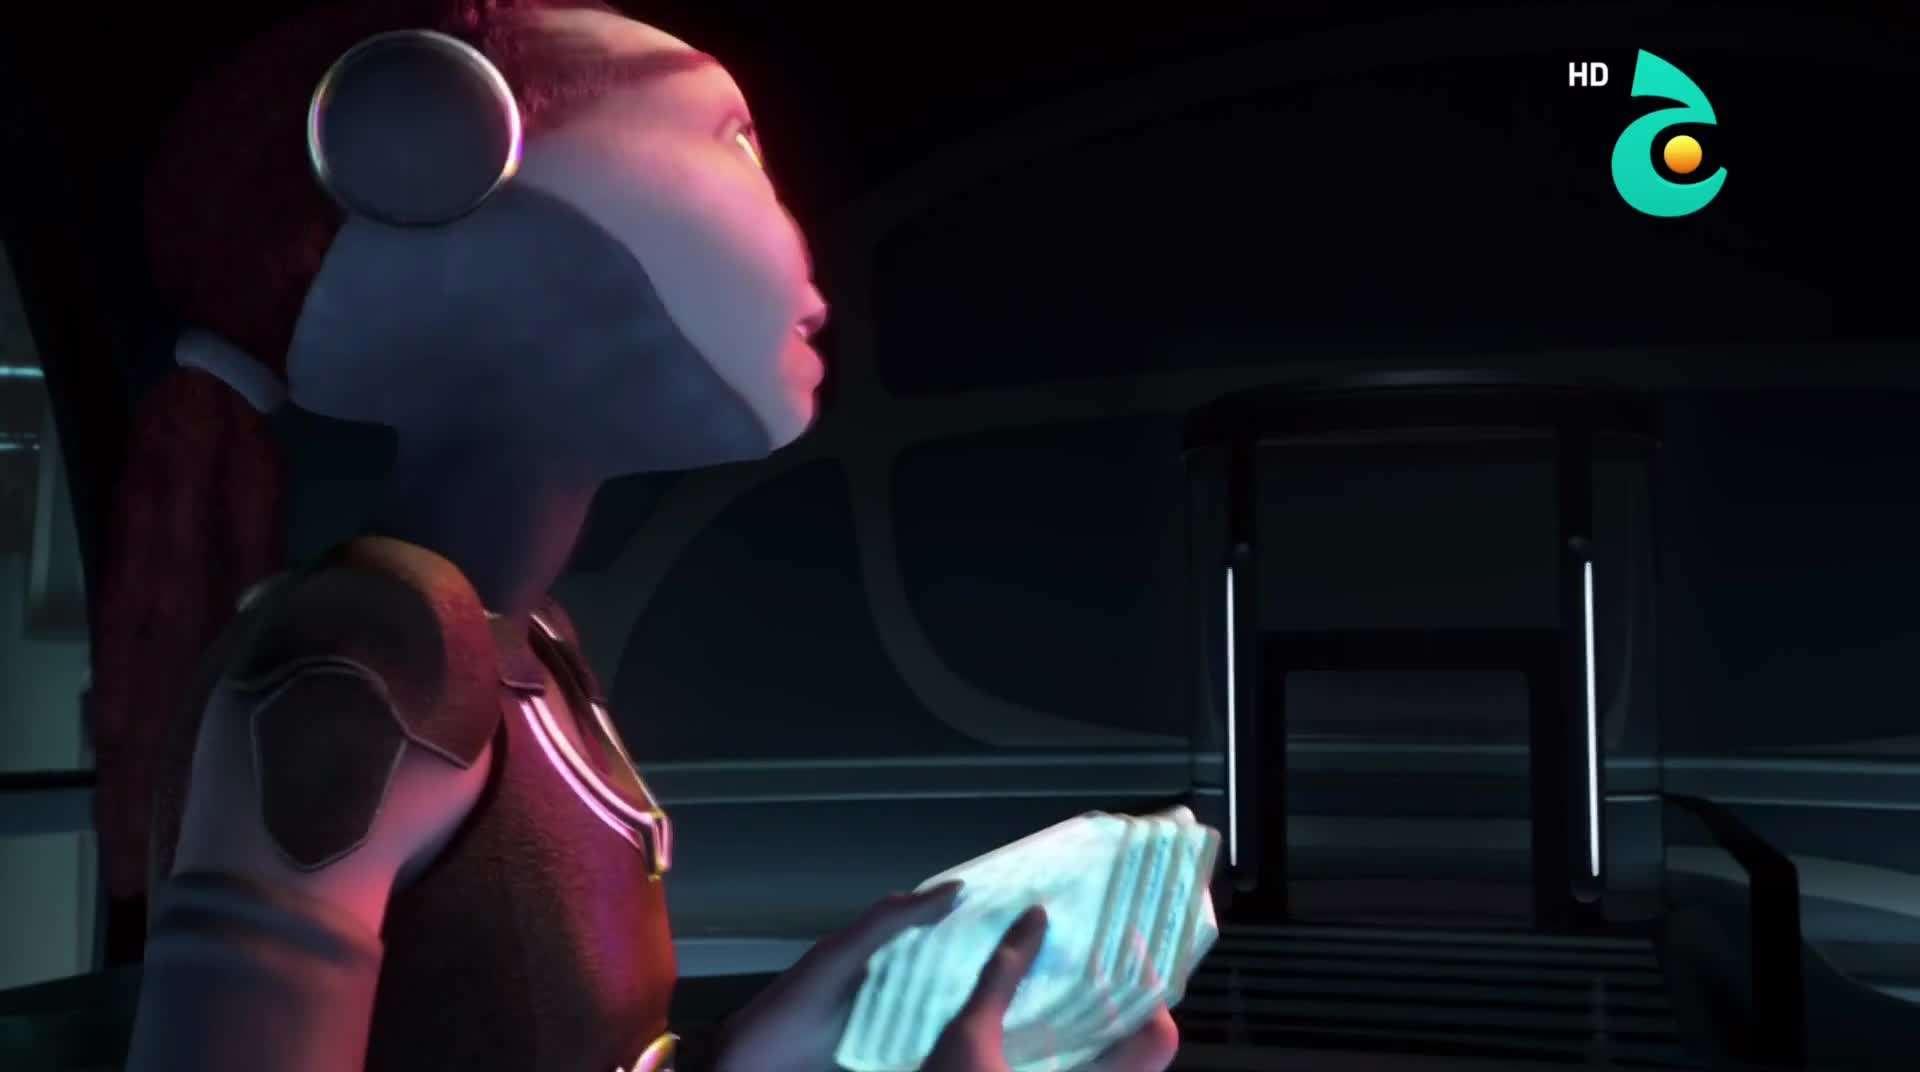 ميلو ورحلة الانقاذ Mars Needs Moms (2011) HDTV 1080p تحميل تورنت 8 arabp2p.com